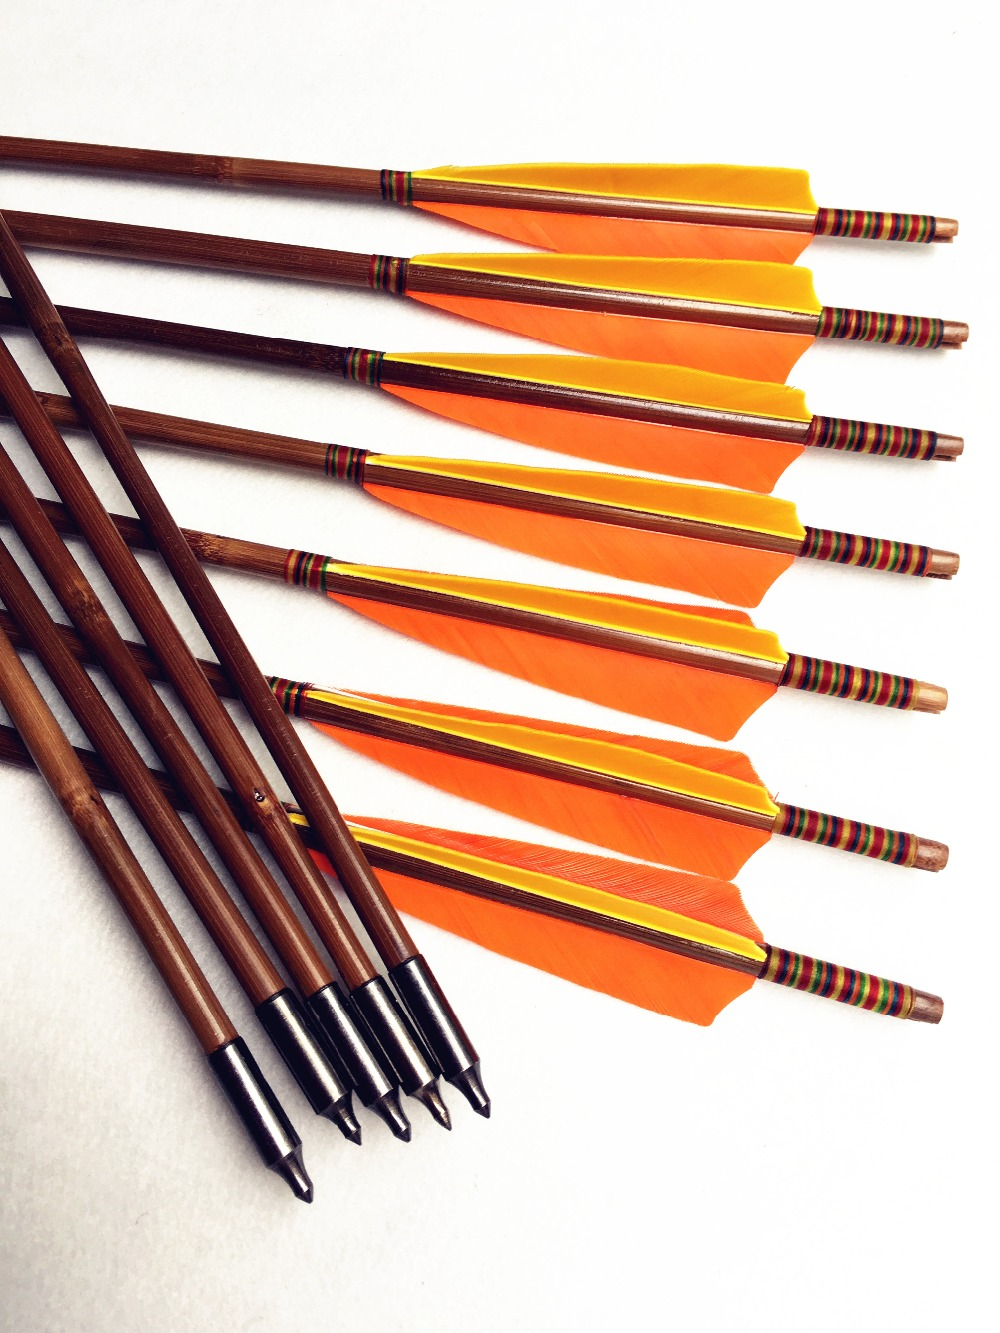 12 pk handmade Yellow & orange turkey feather bamboo arrows shooting  recurve longbow hunters lovers